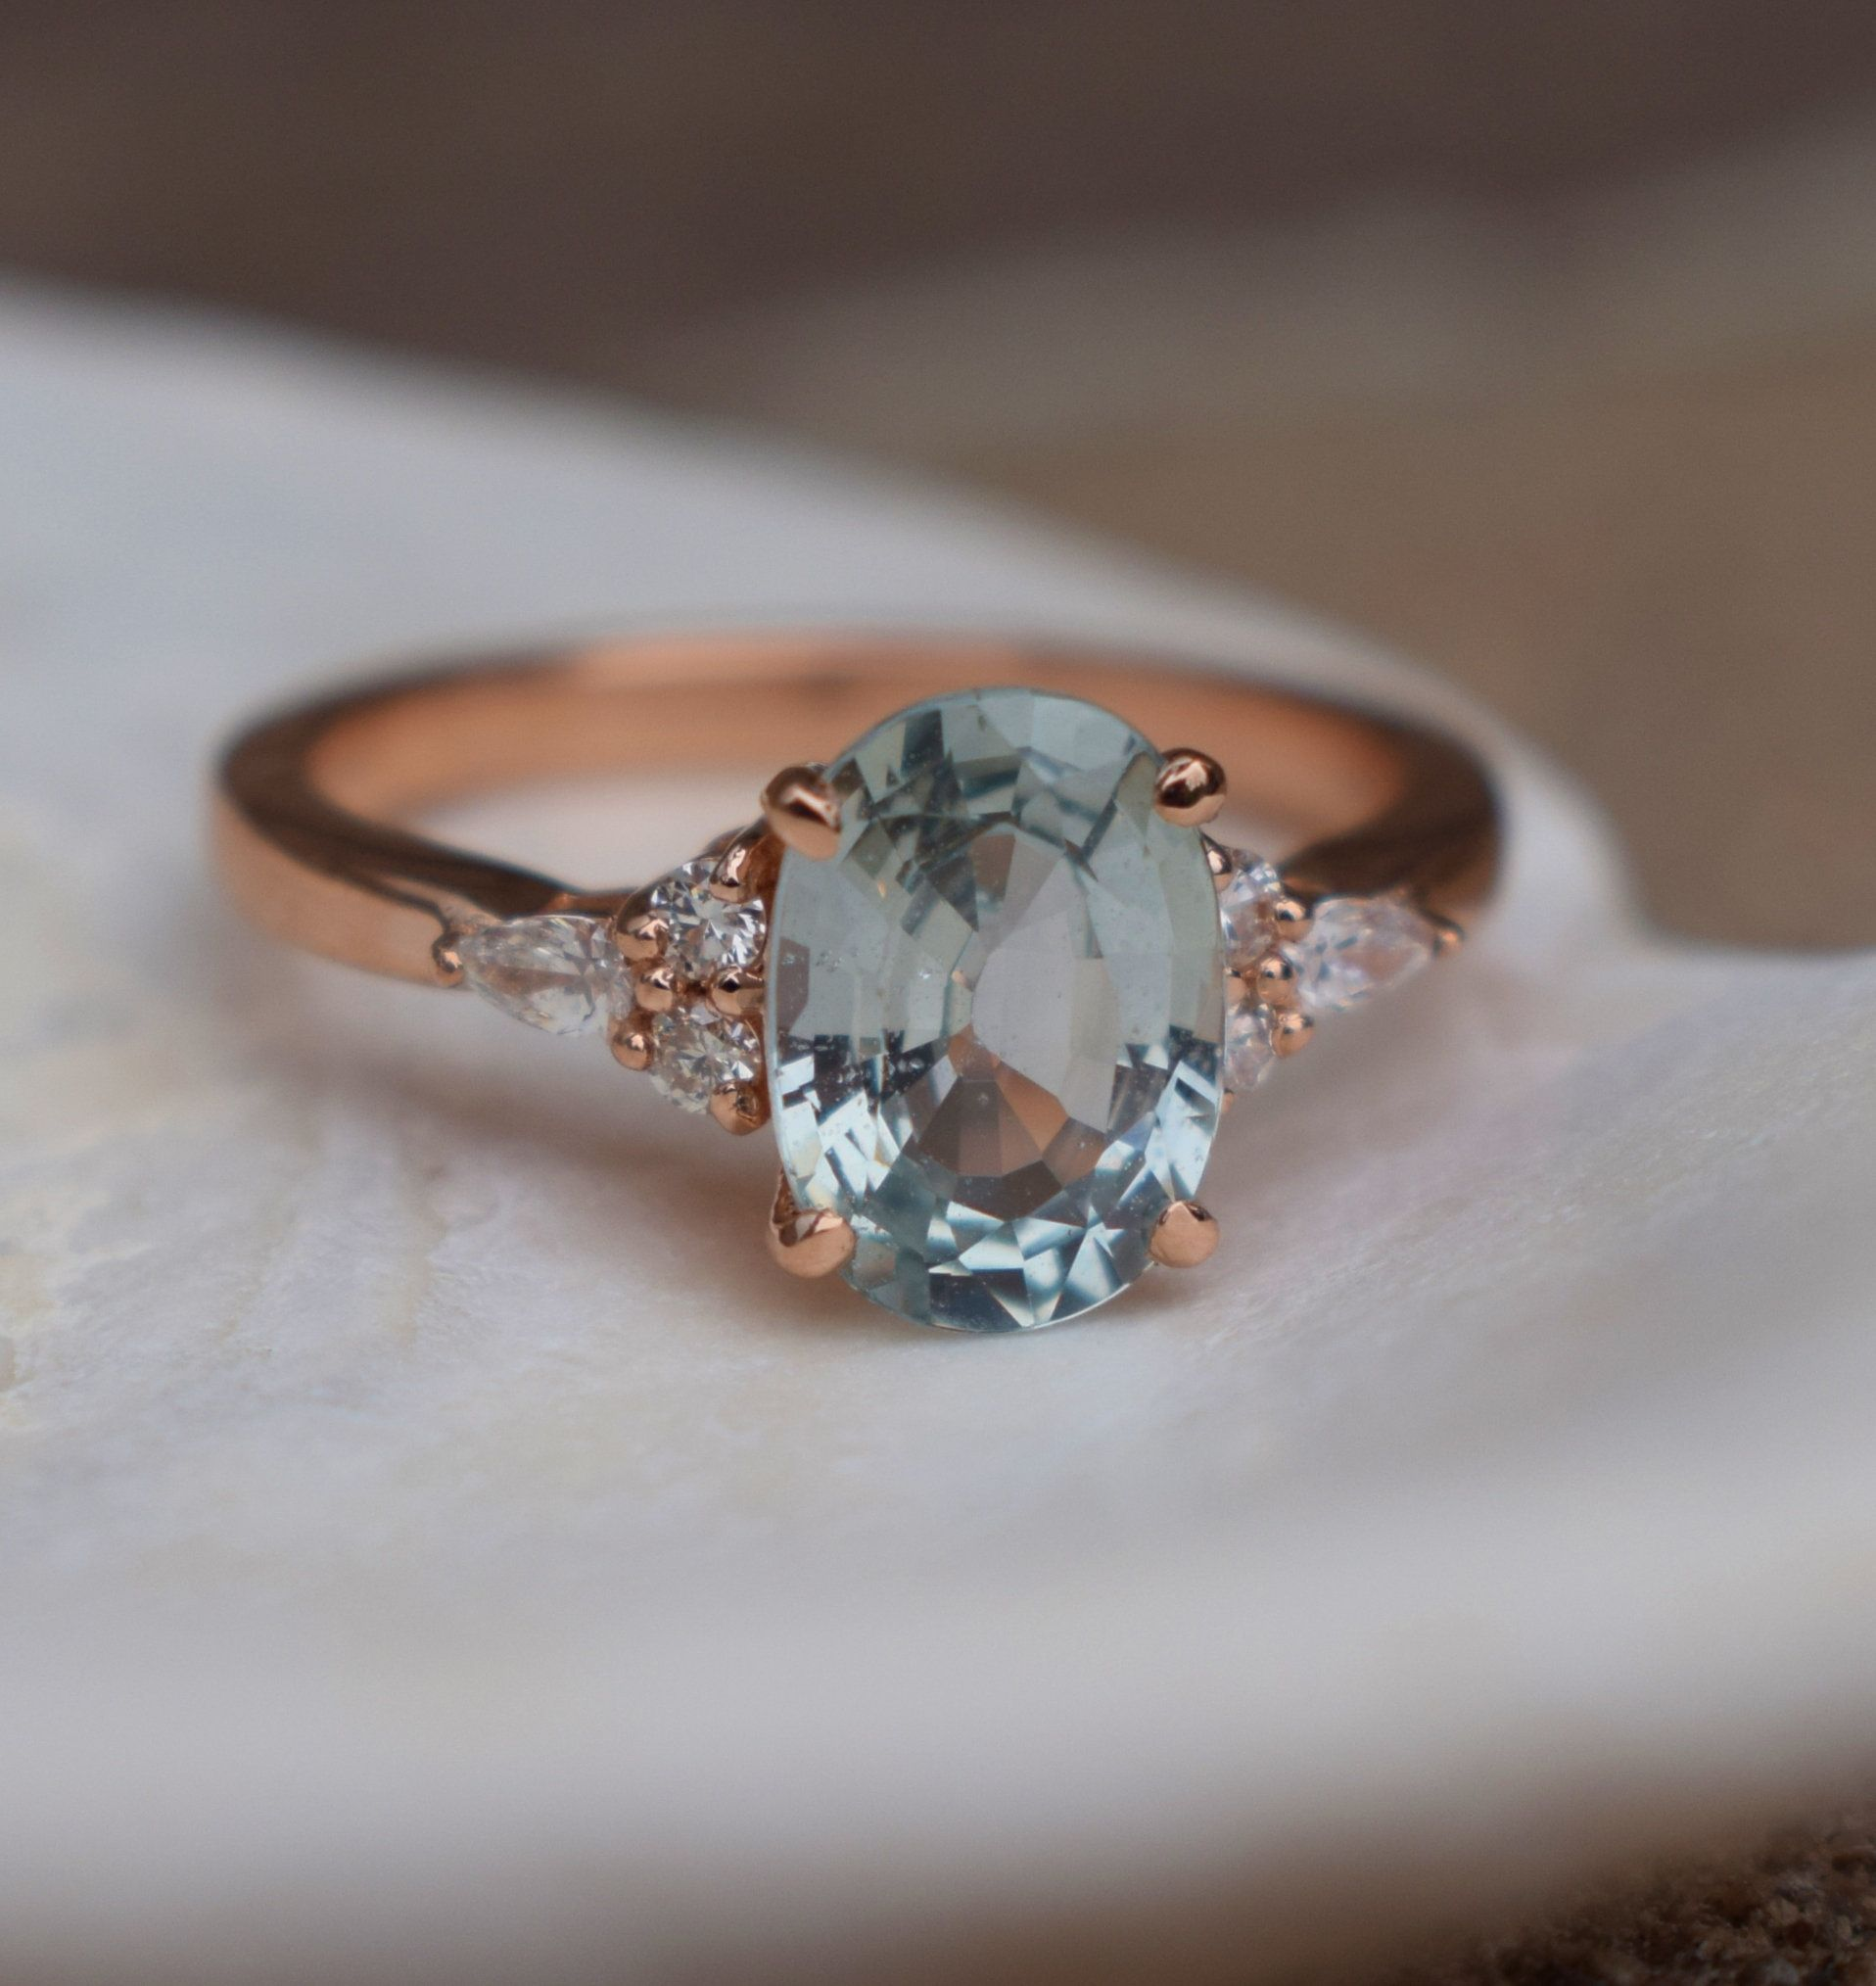 Mint Sapphire Engagement Ring Eidelprecious Campari Ring Light Blue Green Blue Engagement Ring Sapphire Engagement Ring Blue Blue Engagement Ring Aquamarines